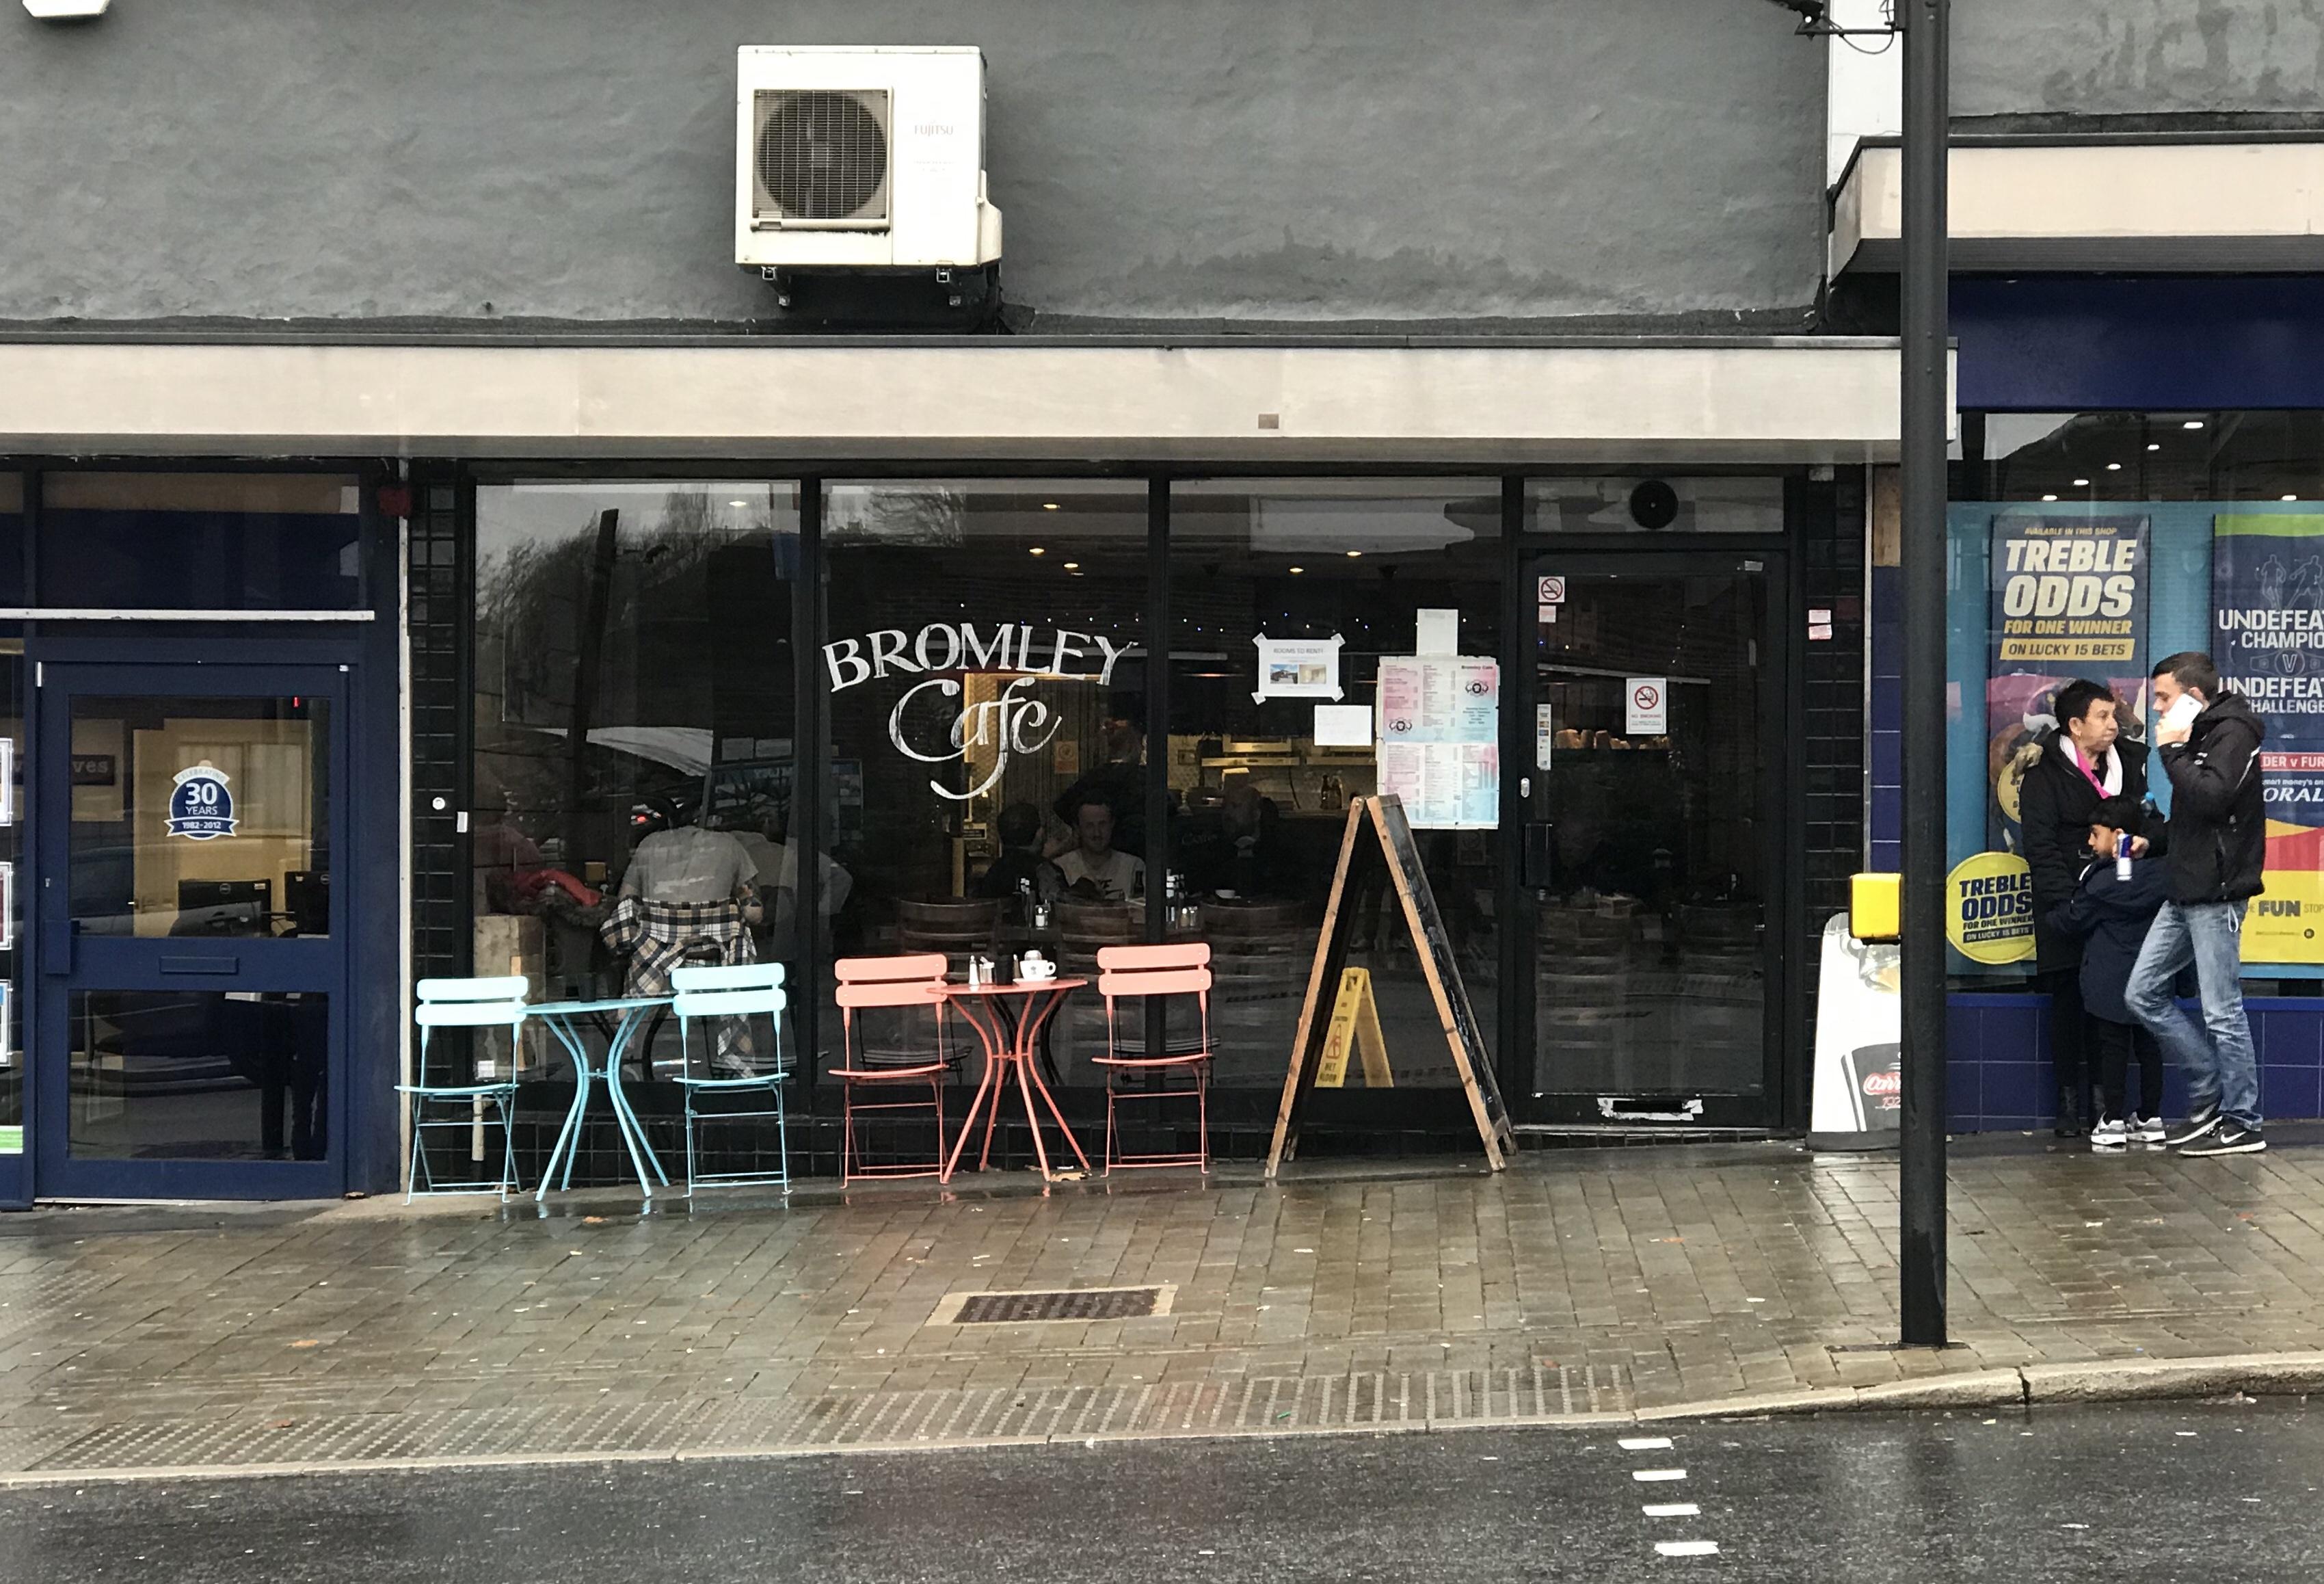 Bromley Cafe ロンドン イギリス